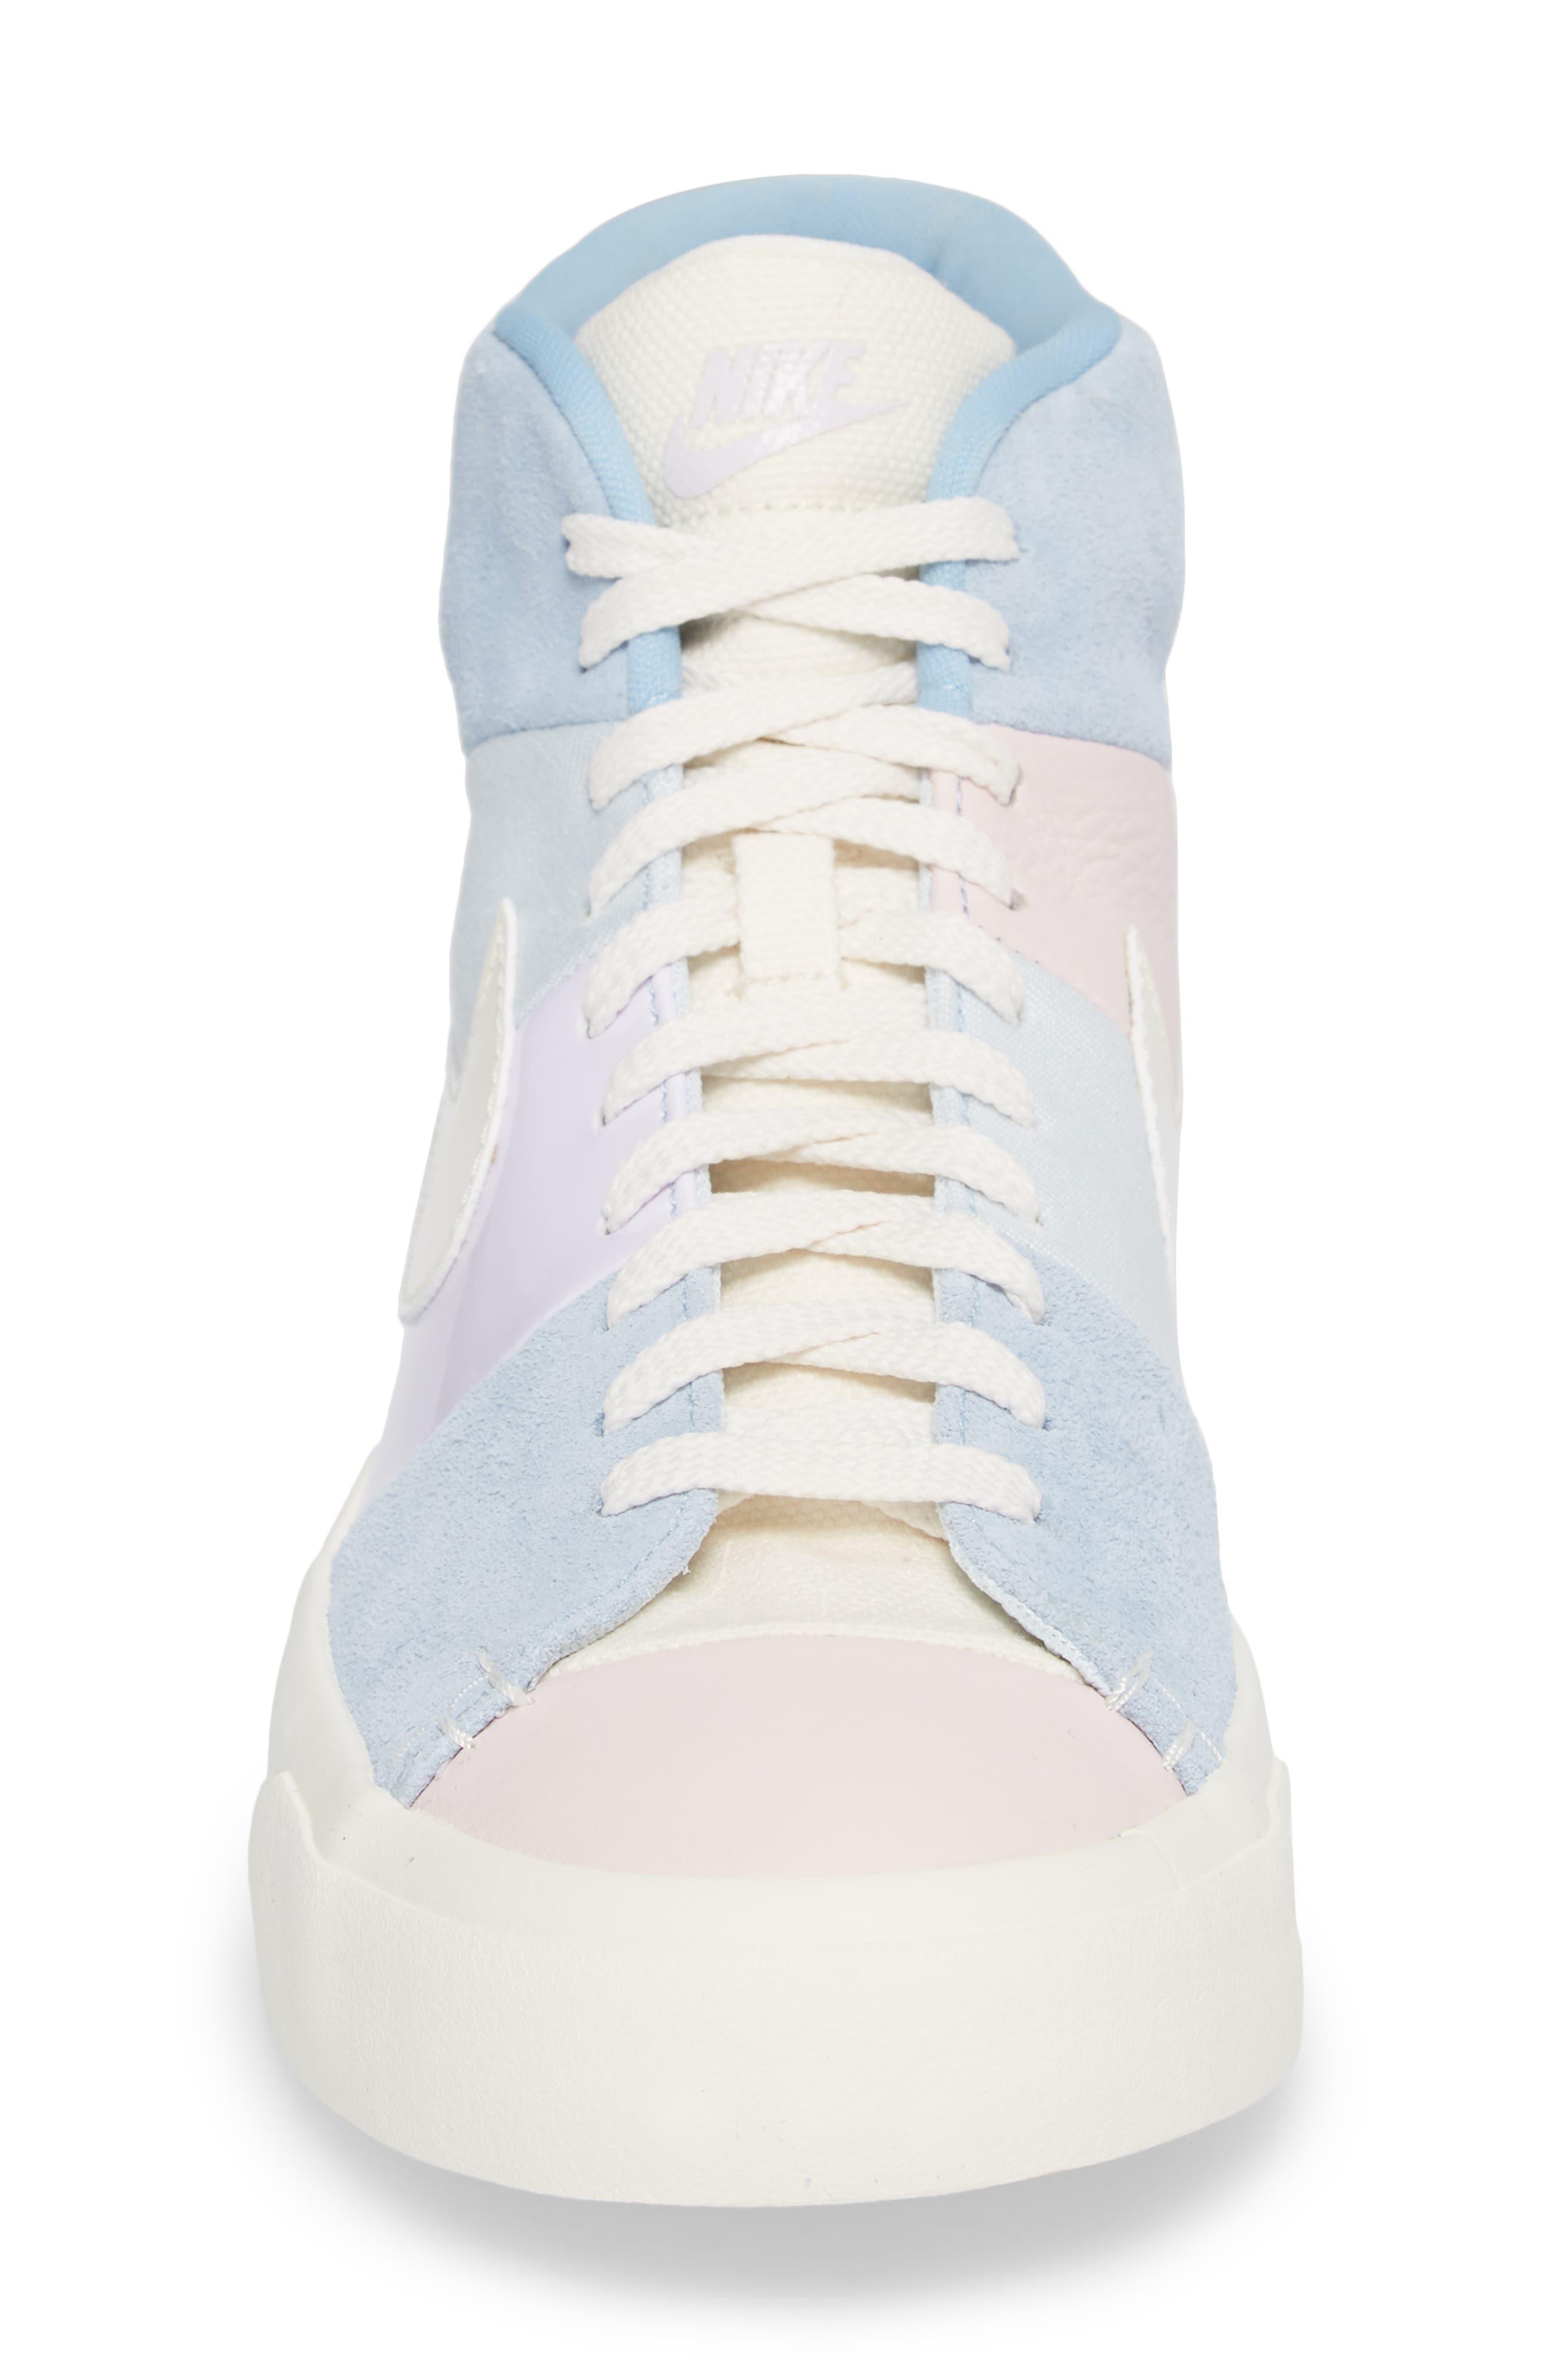 Blazer Royal Easter QS High Top Sneaker,                             Alternate thumbnail 4, color,                             650